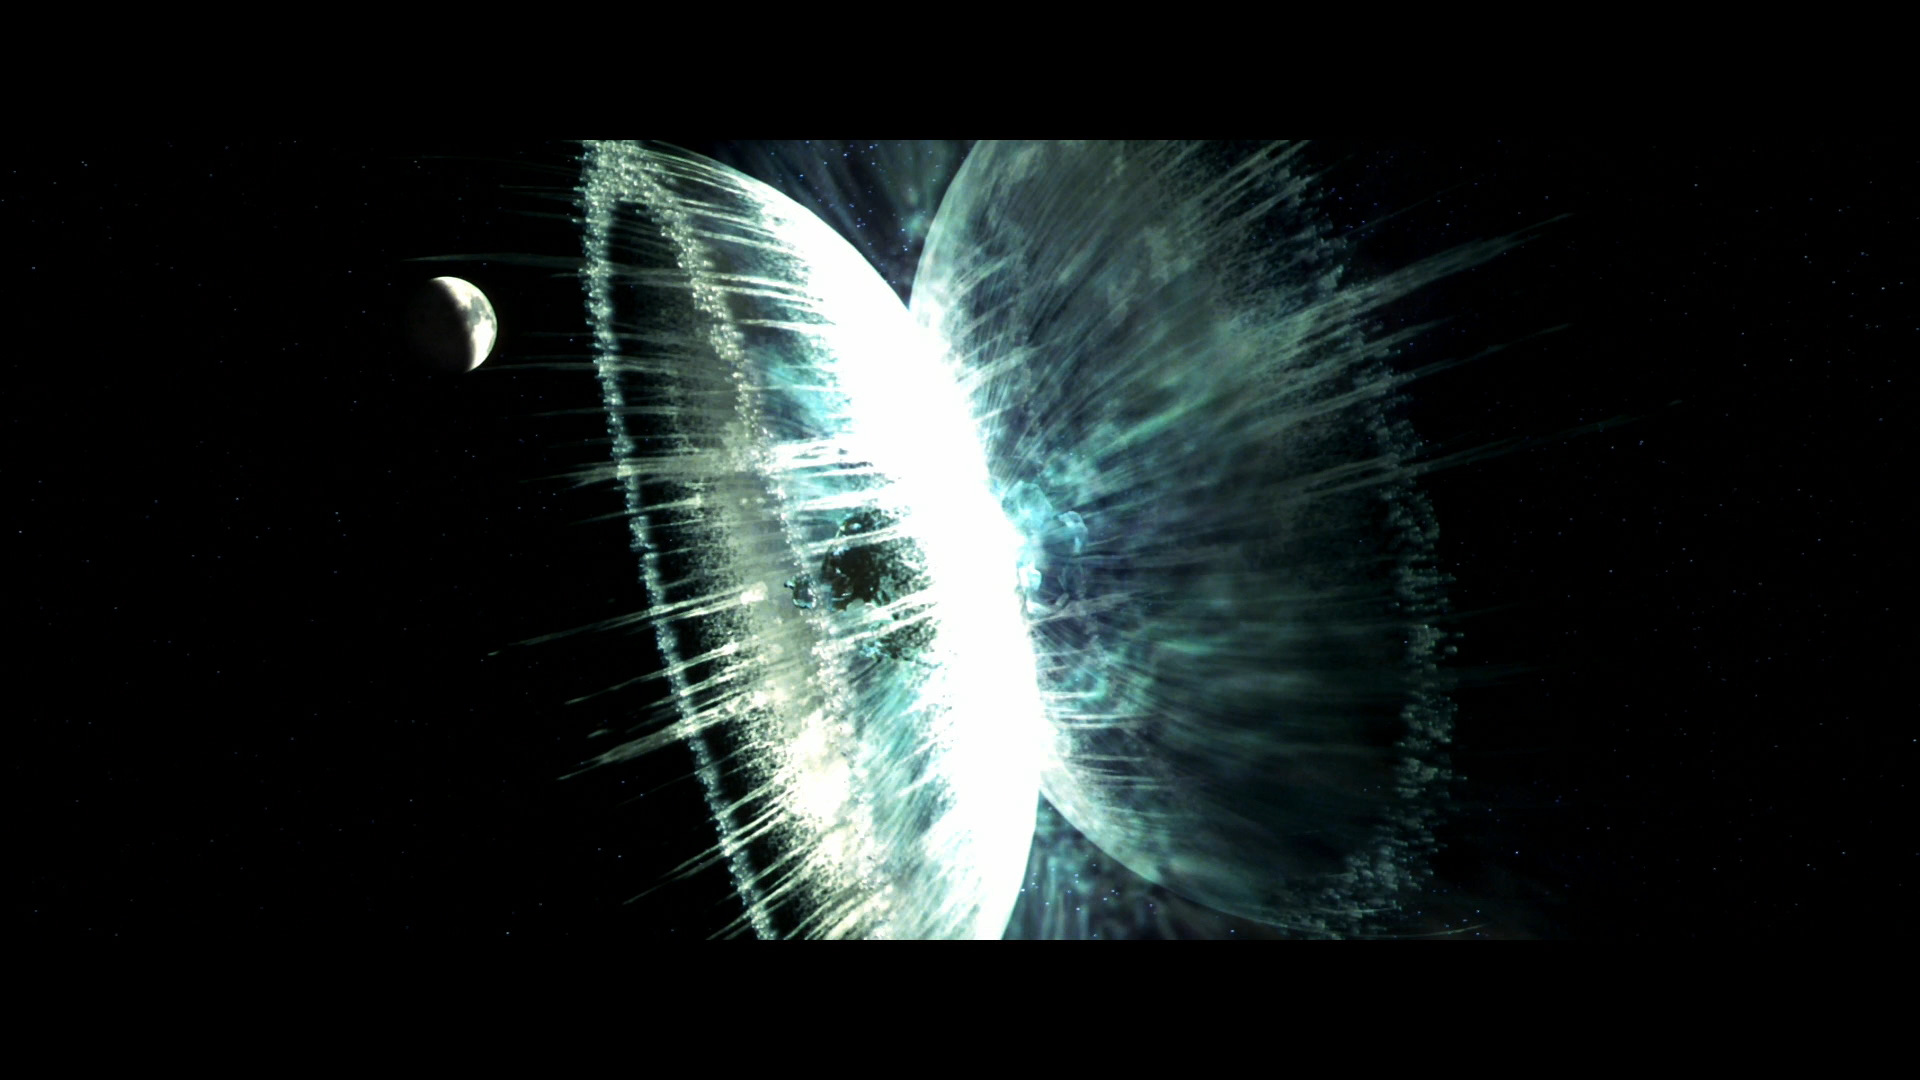 Armageddon Theme Song   Movie Theme Songs & TV Soundtracks